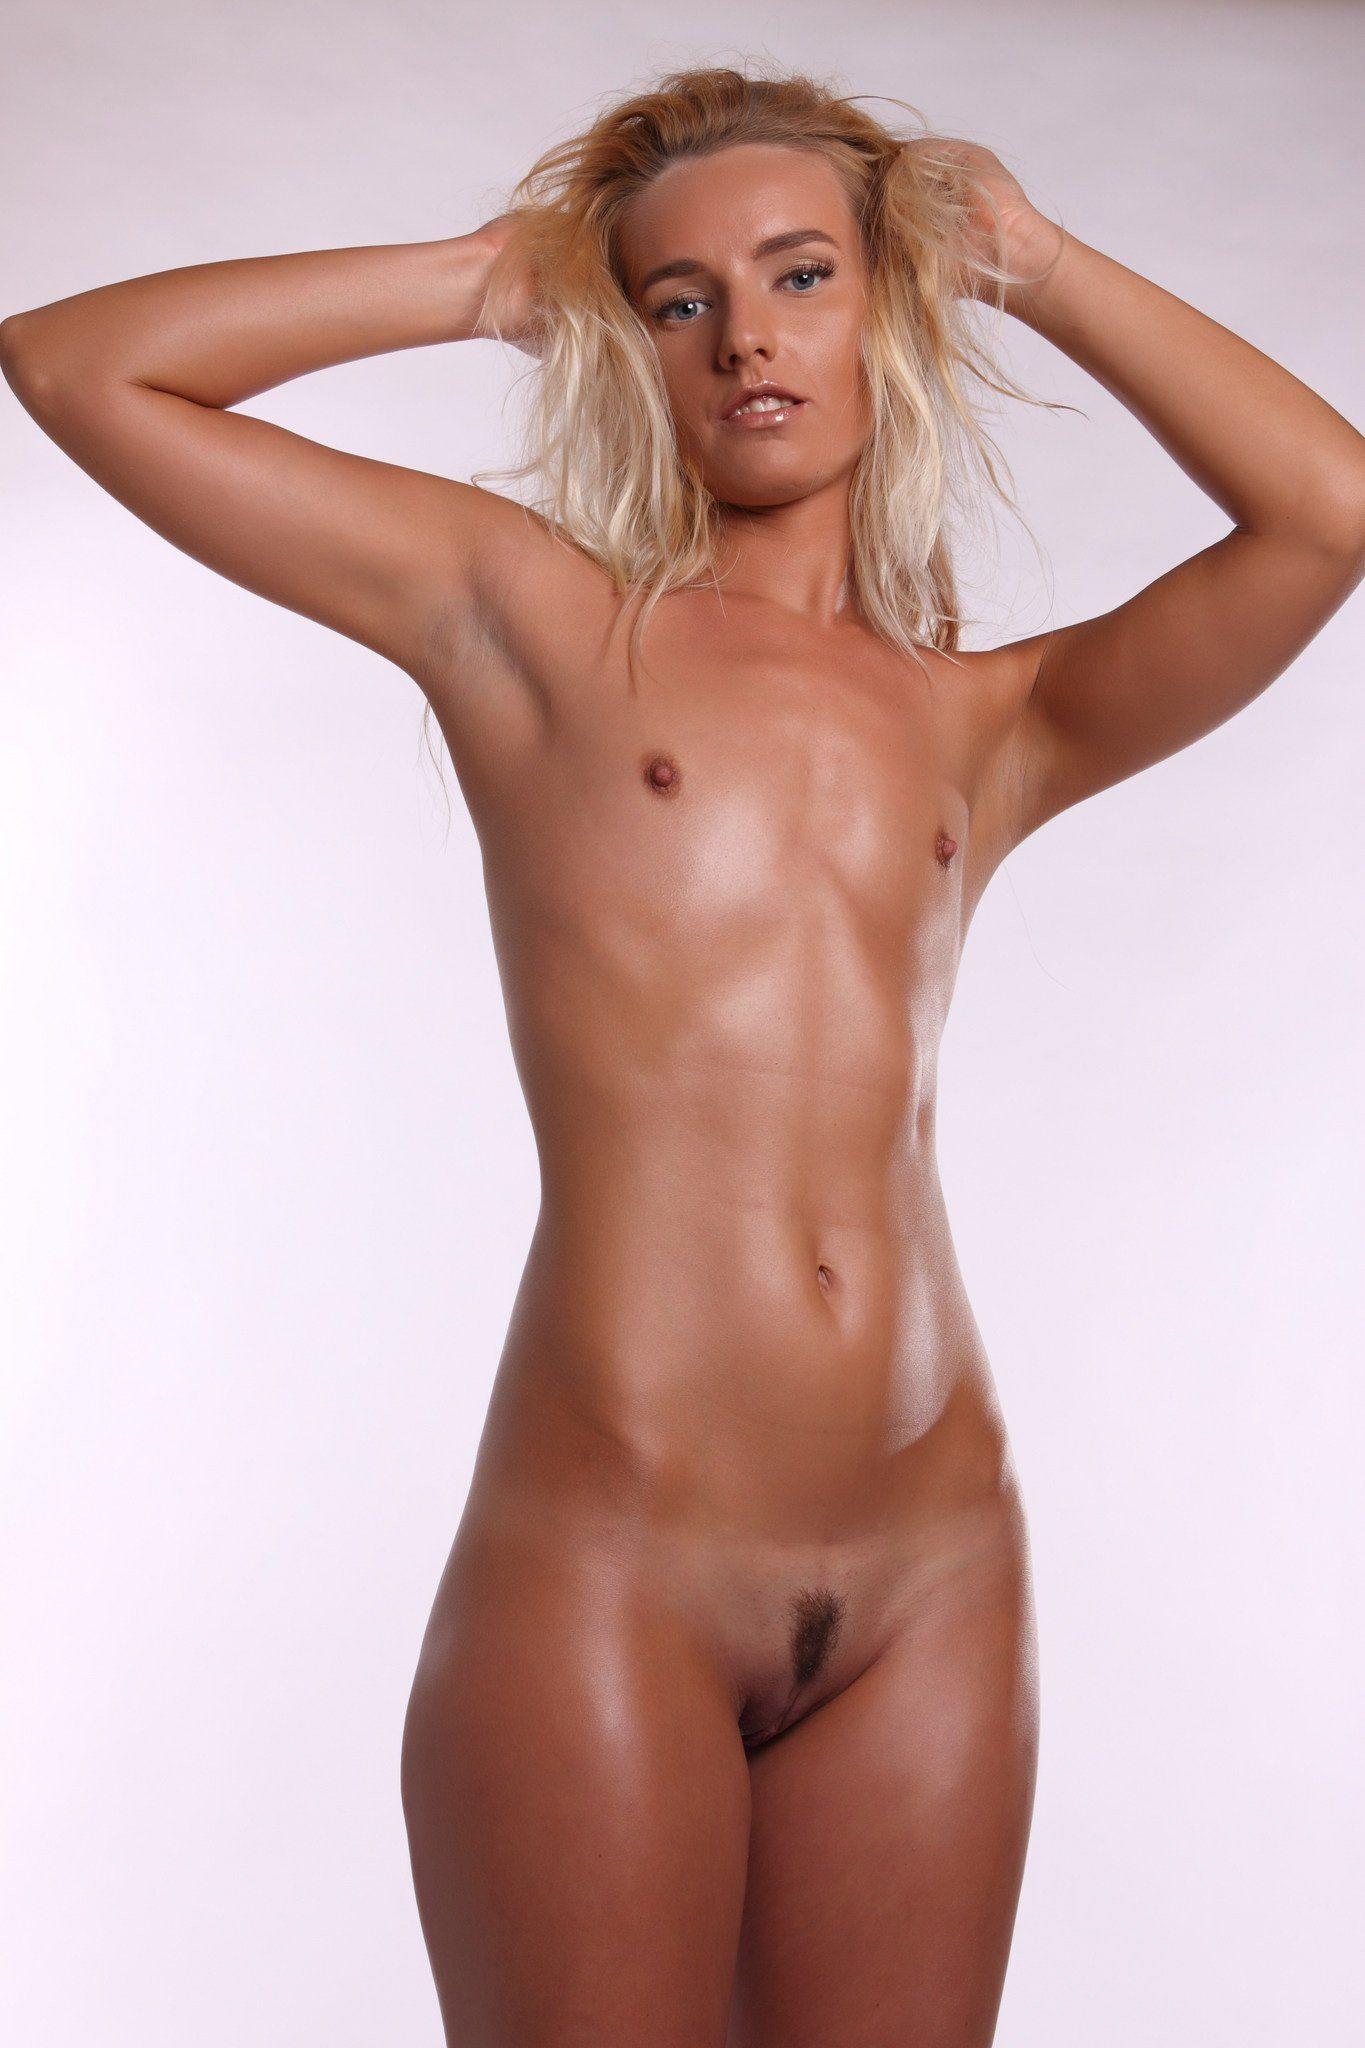 Sexy blonde pornstar having sex